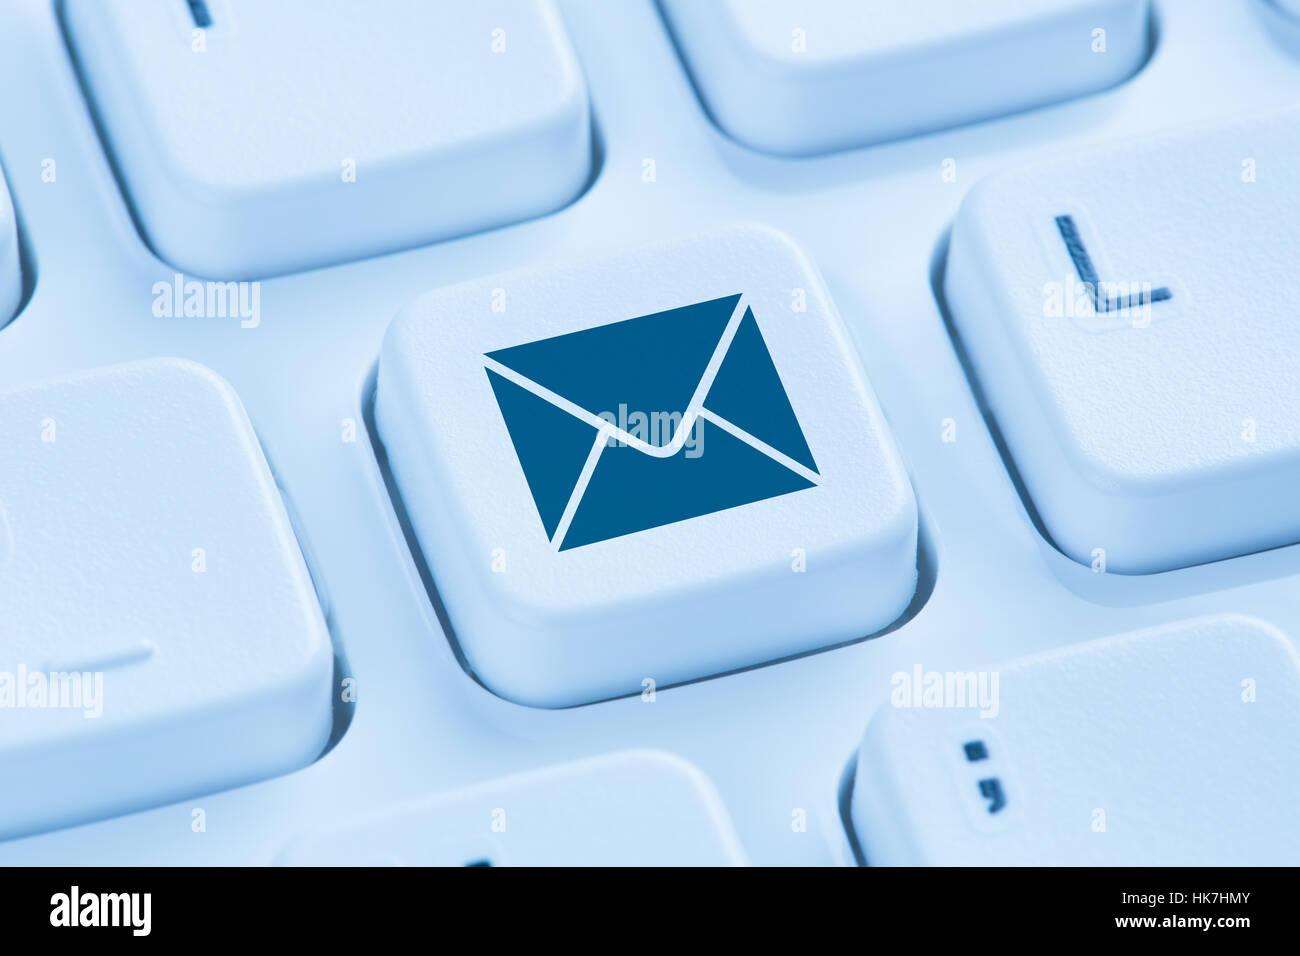 Sending E-Mail email letter internet symbol blue computer keyboard - Stock Image